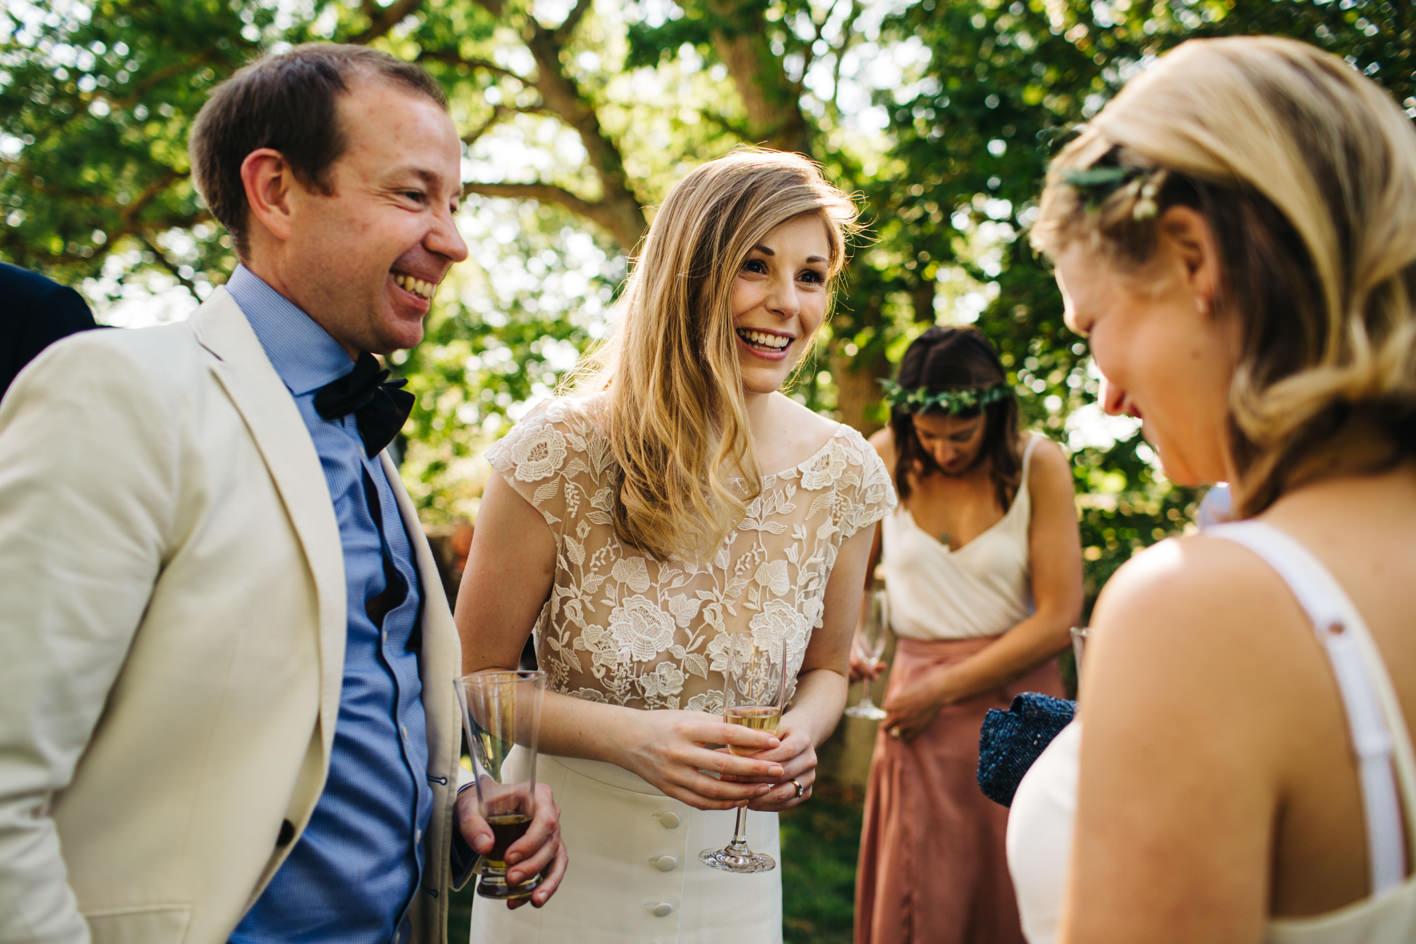 Chateau de lartigolle wedding near toulouse 070